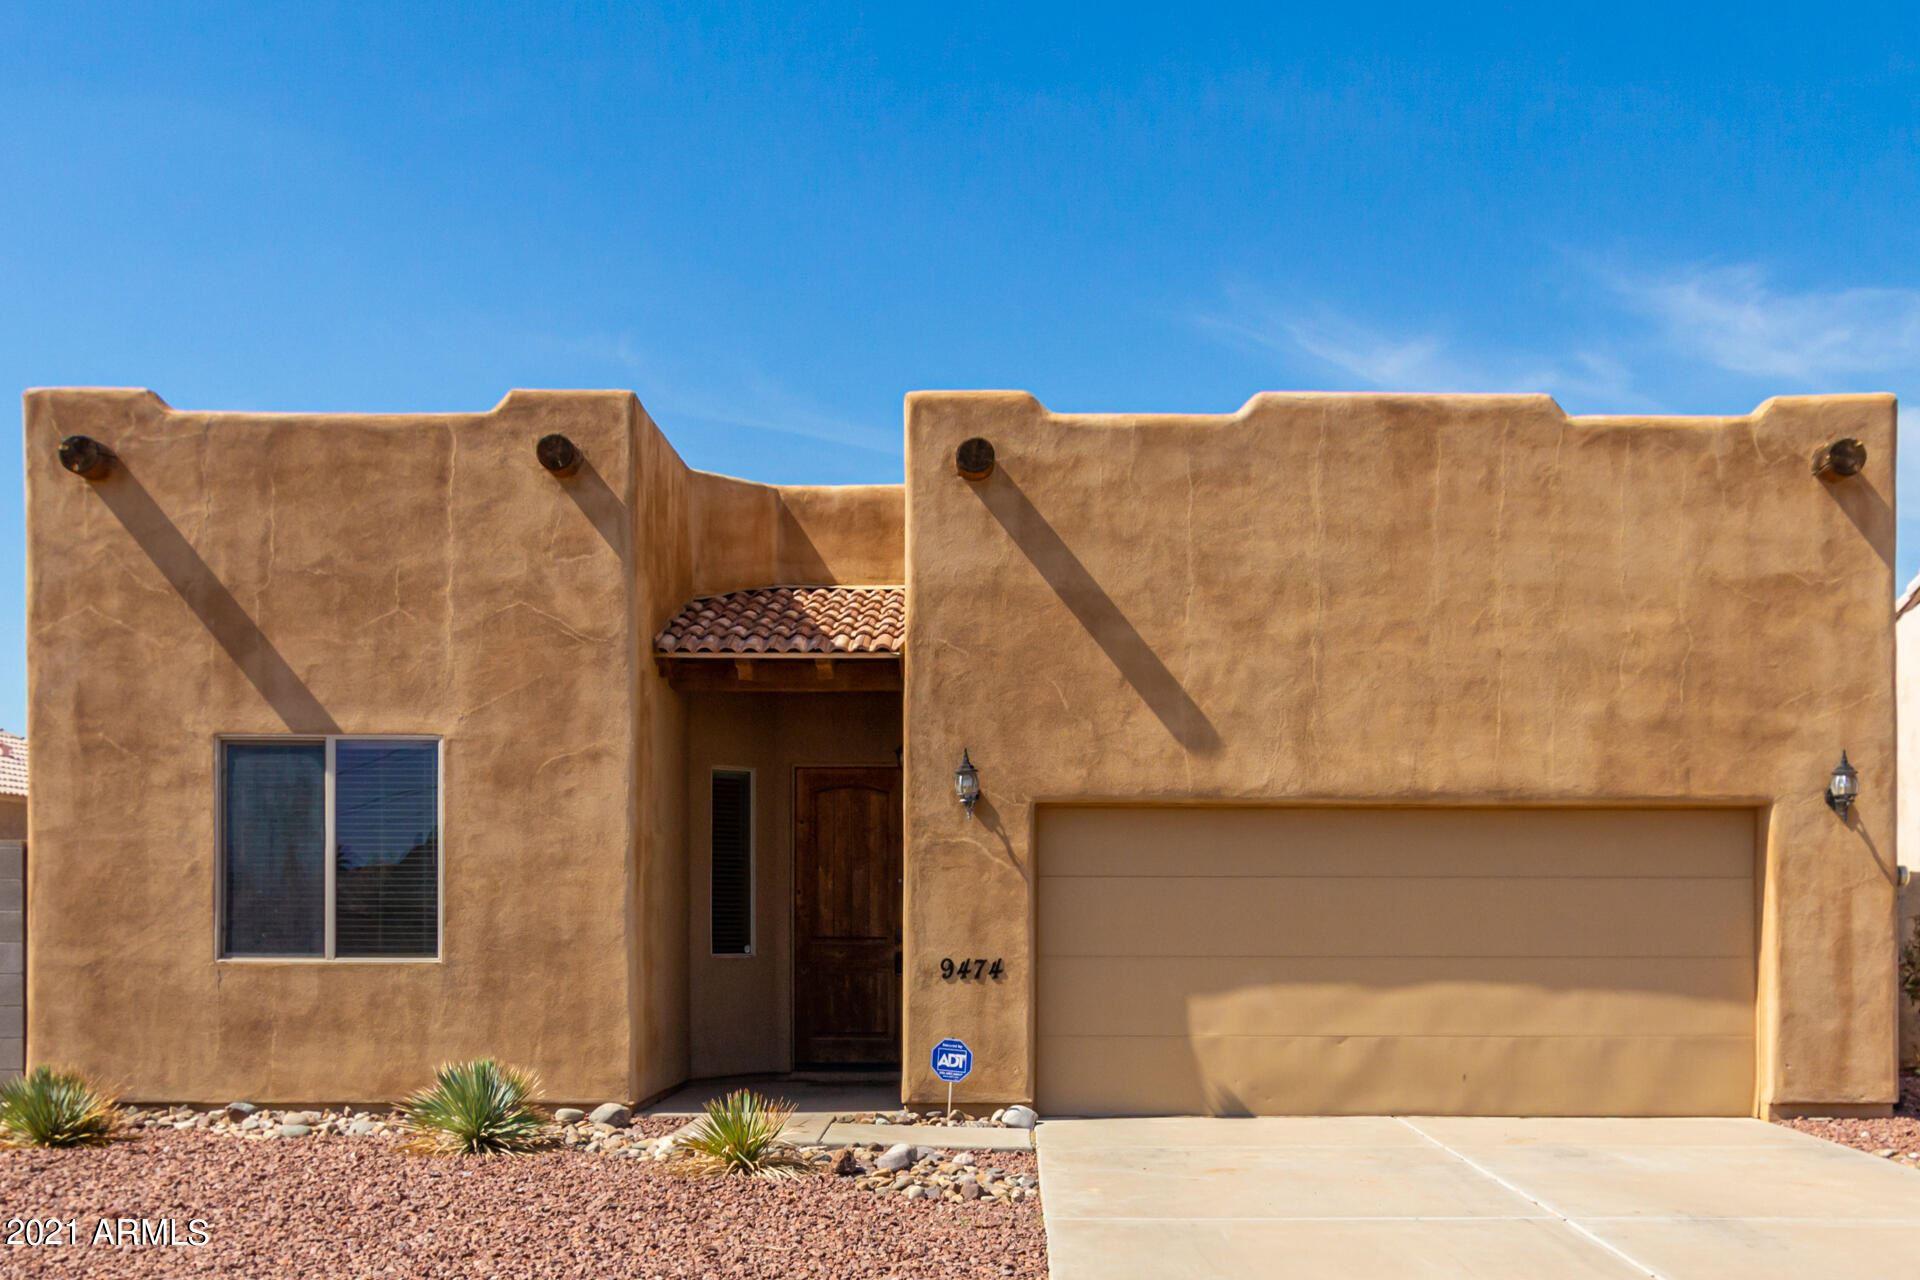 9474 W PINEVETA Drive, Arizona City, AZ 85123 - MLS#: 6271254